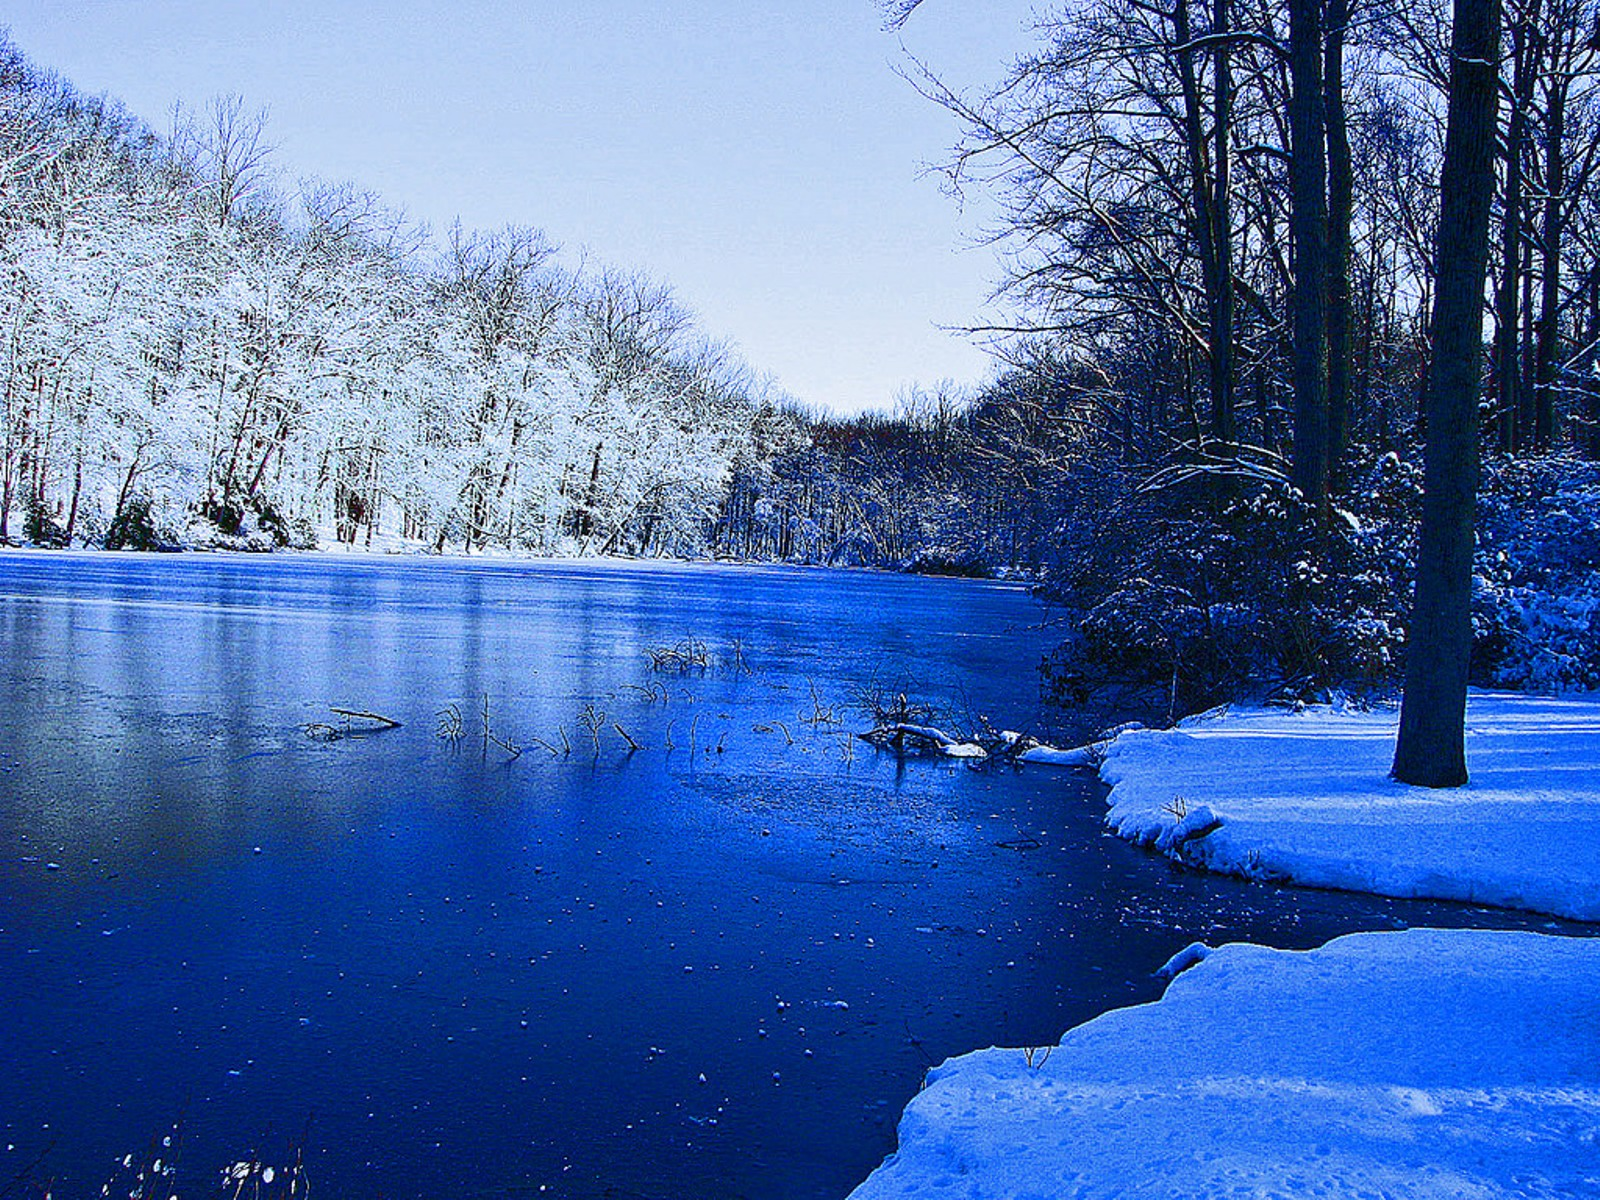 Winter-Scenery-16